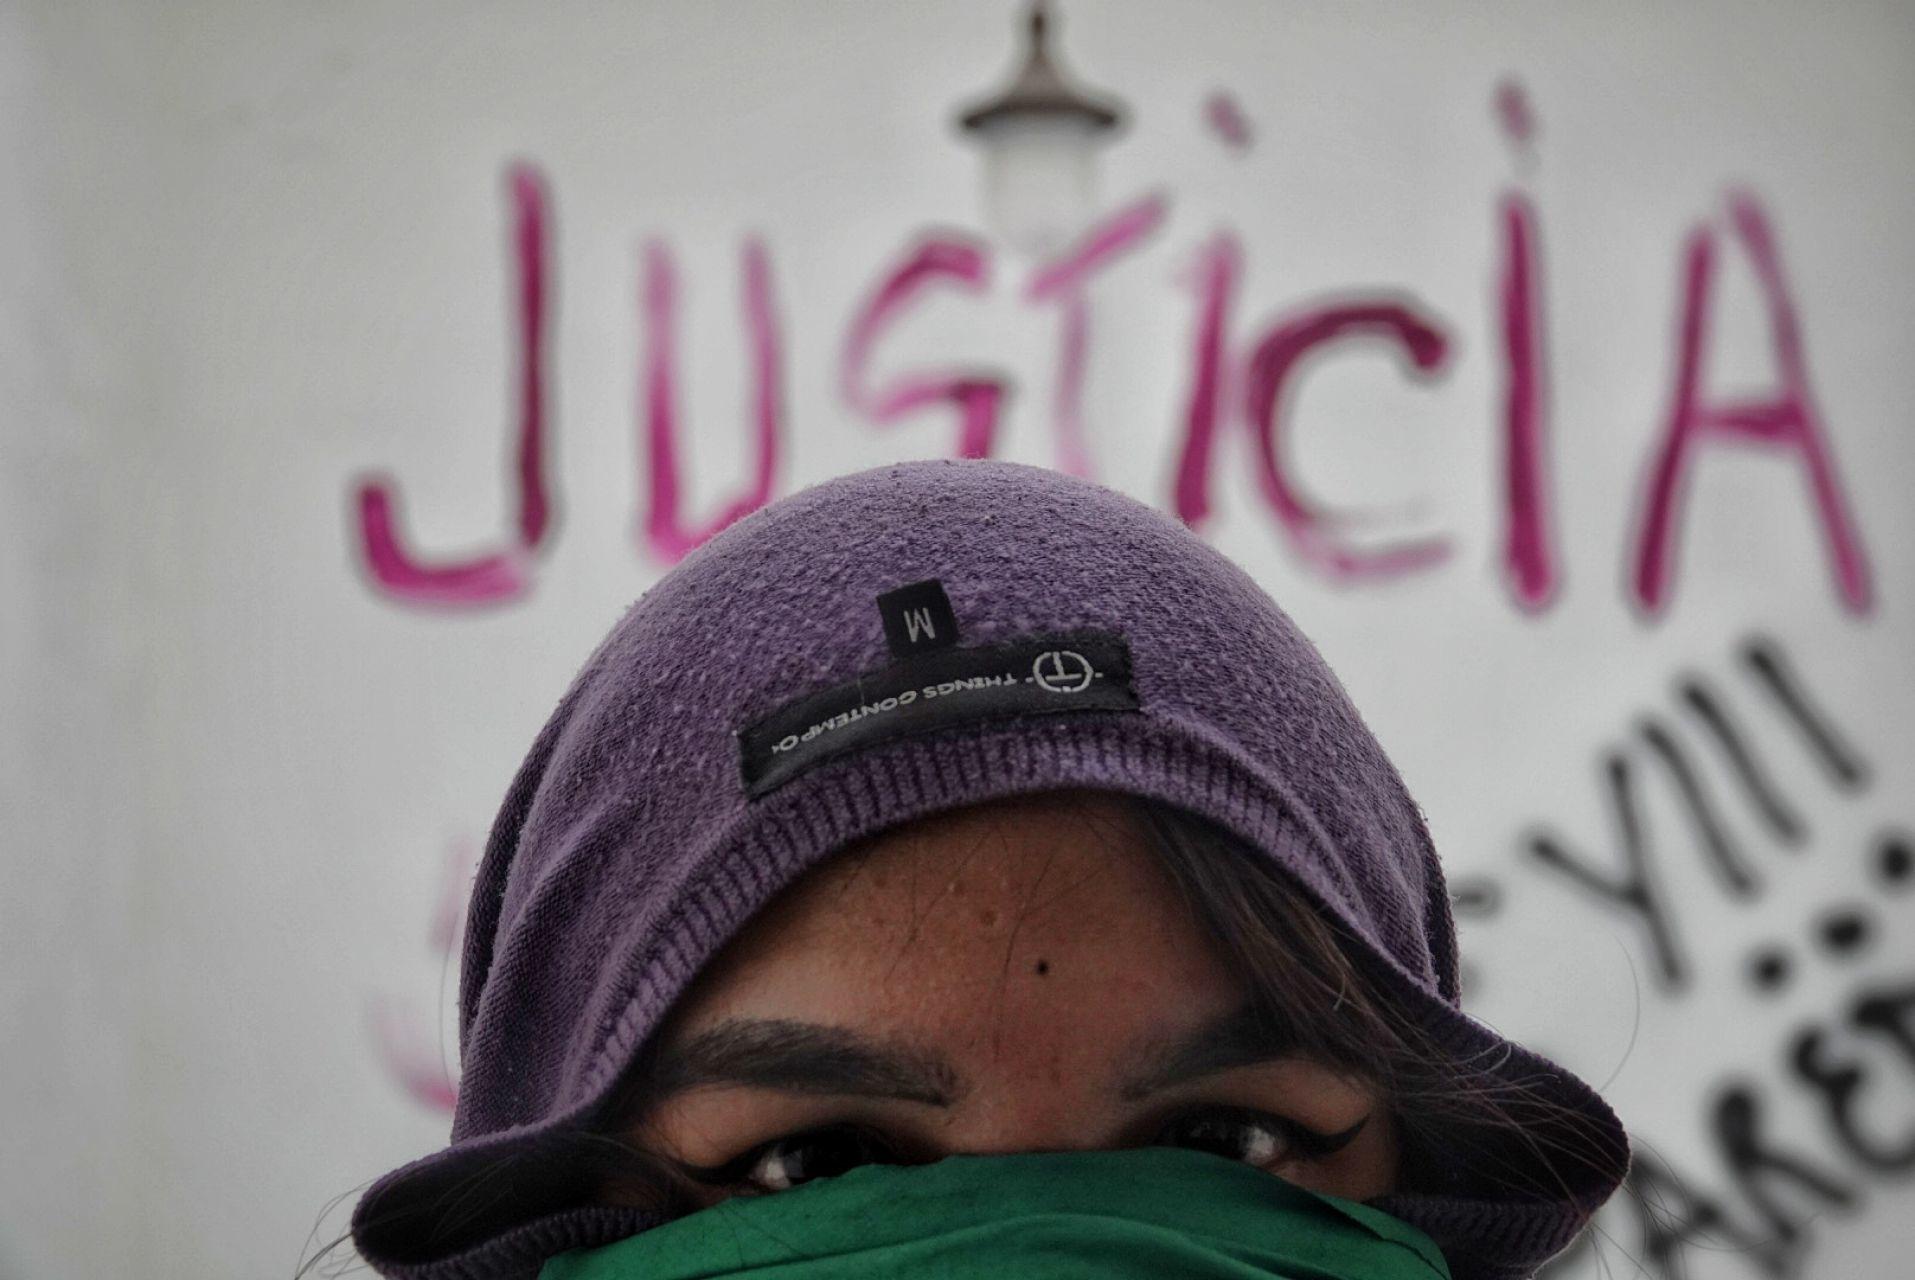 fotos-videos-imagenes-toma-feminista-cndh-oficinas-centro-cdmx-rosario-piedra-07